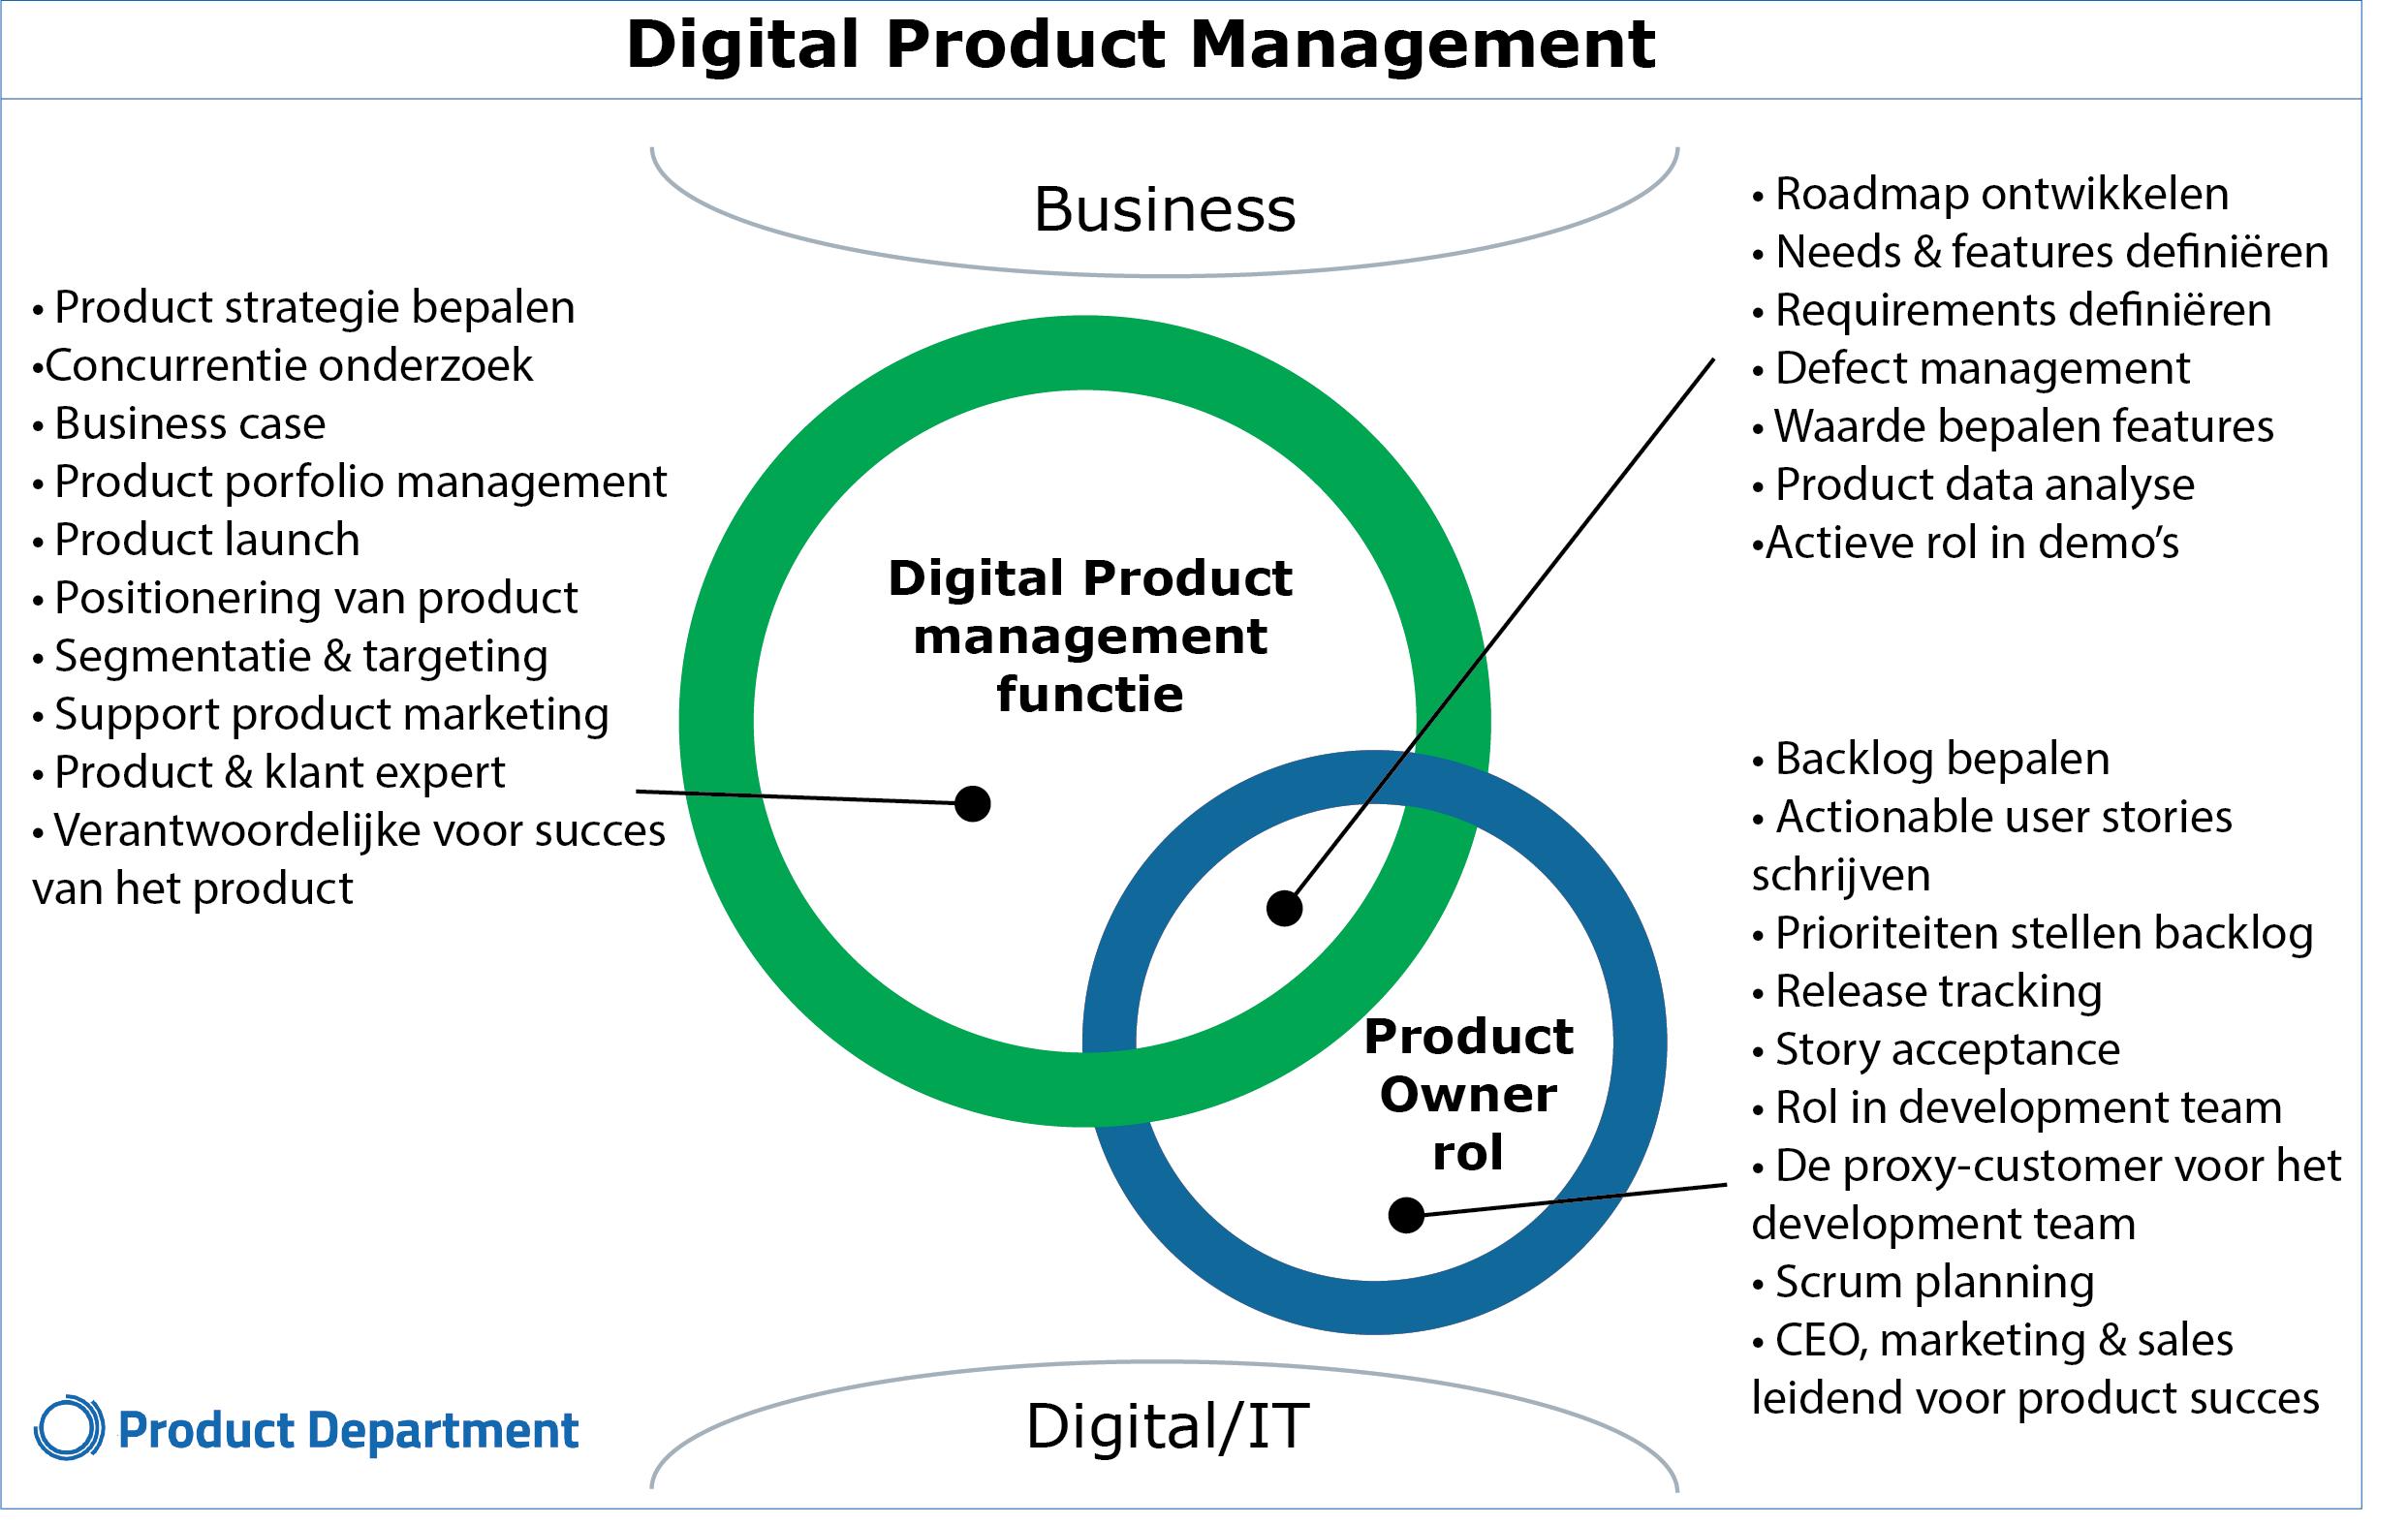 Afbeelding Digital Product Management functie en Product Owner rol